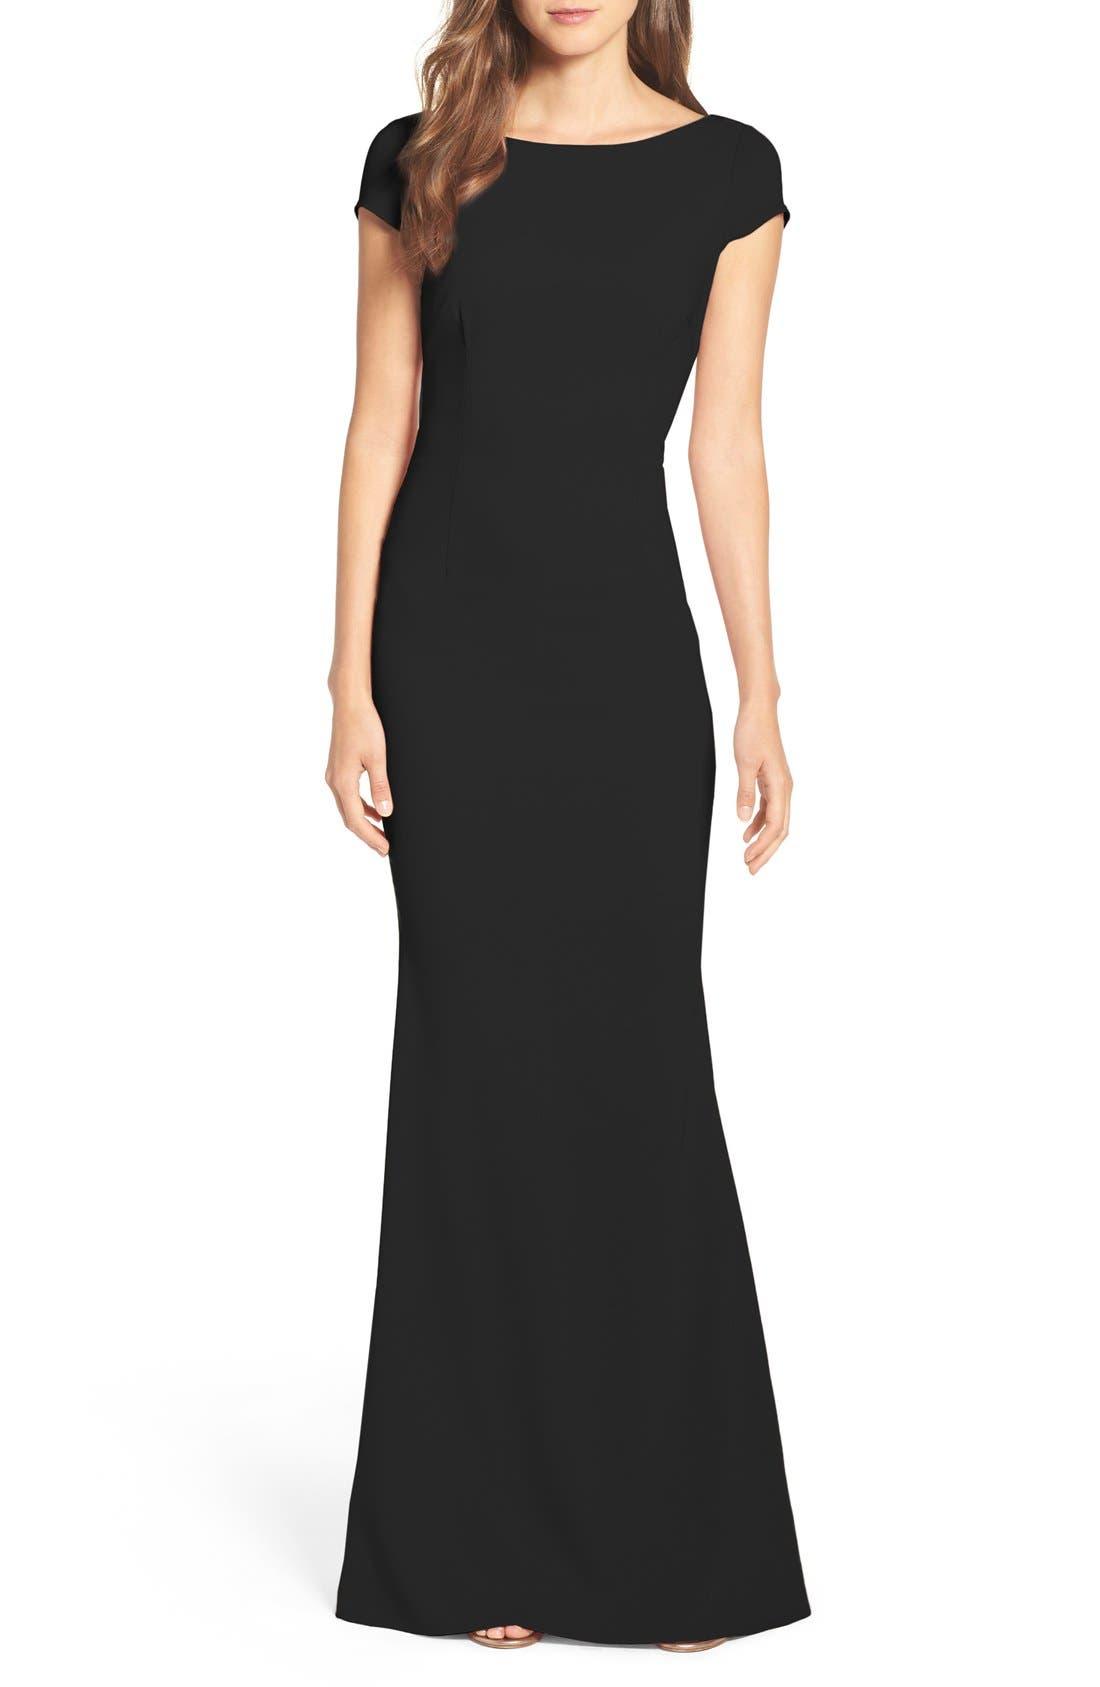 Short Halter Prom Dresses